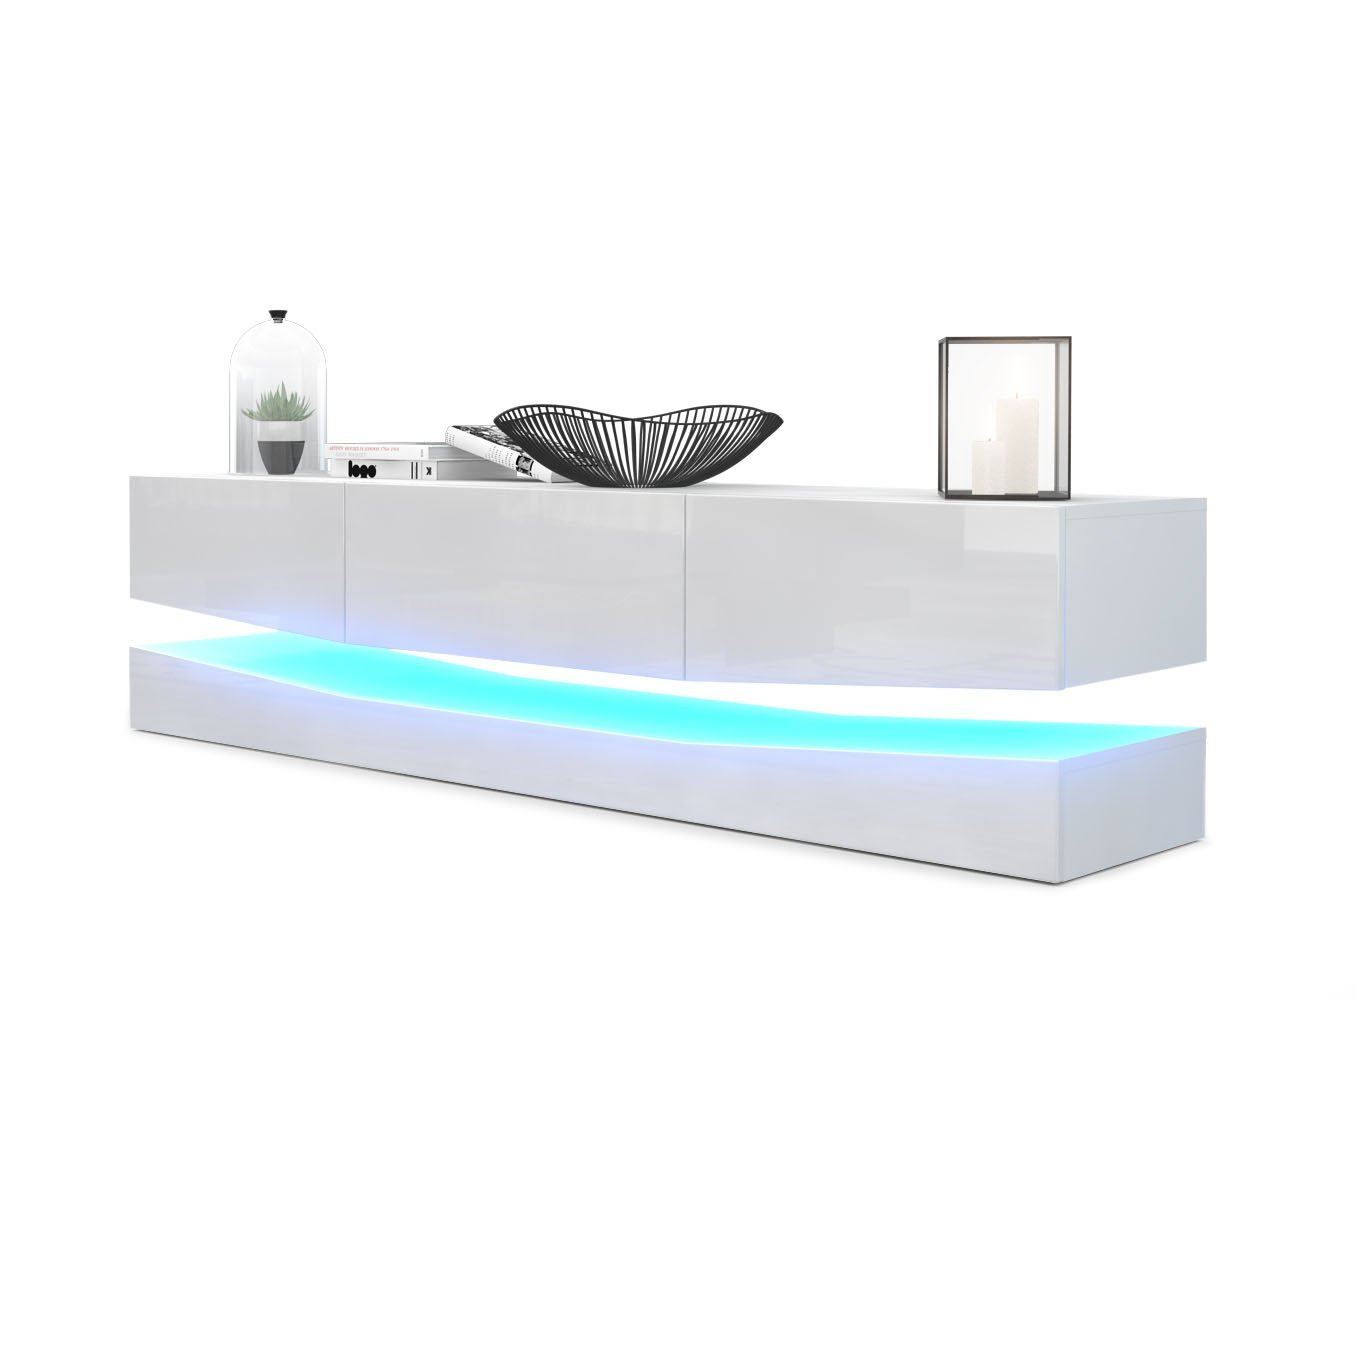 Fronten in WeiãÿHochglanz Korpus matt, mit LED Vladon TV Board Lowboard City, Korpus in Weiß matt Fronten in Weiß Hochglanz inkl. LED Beleuchtung